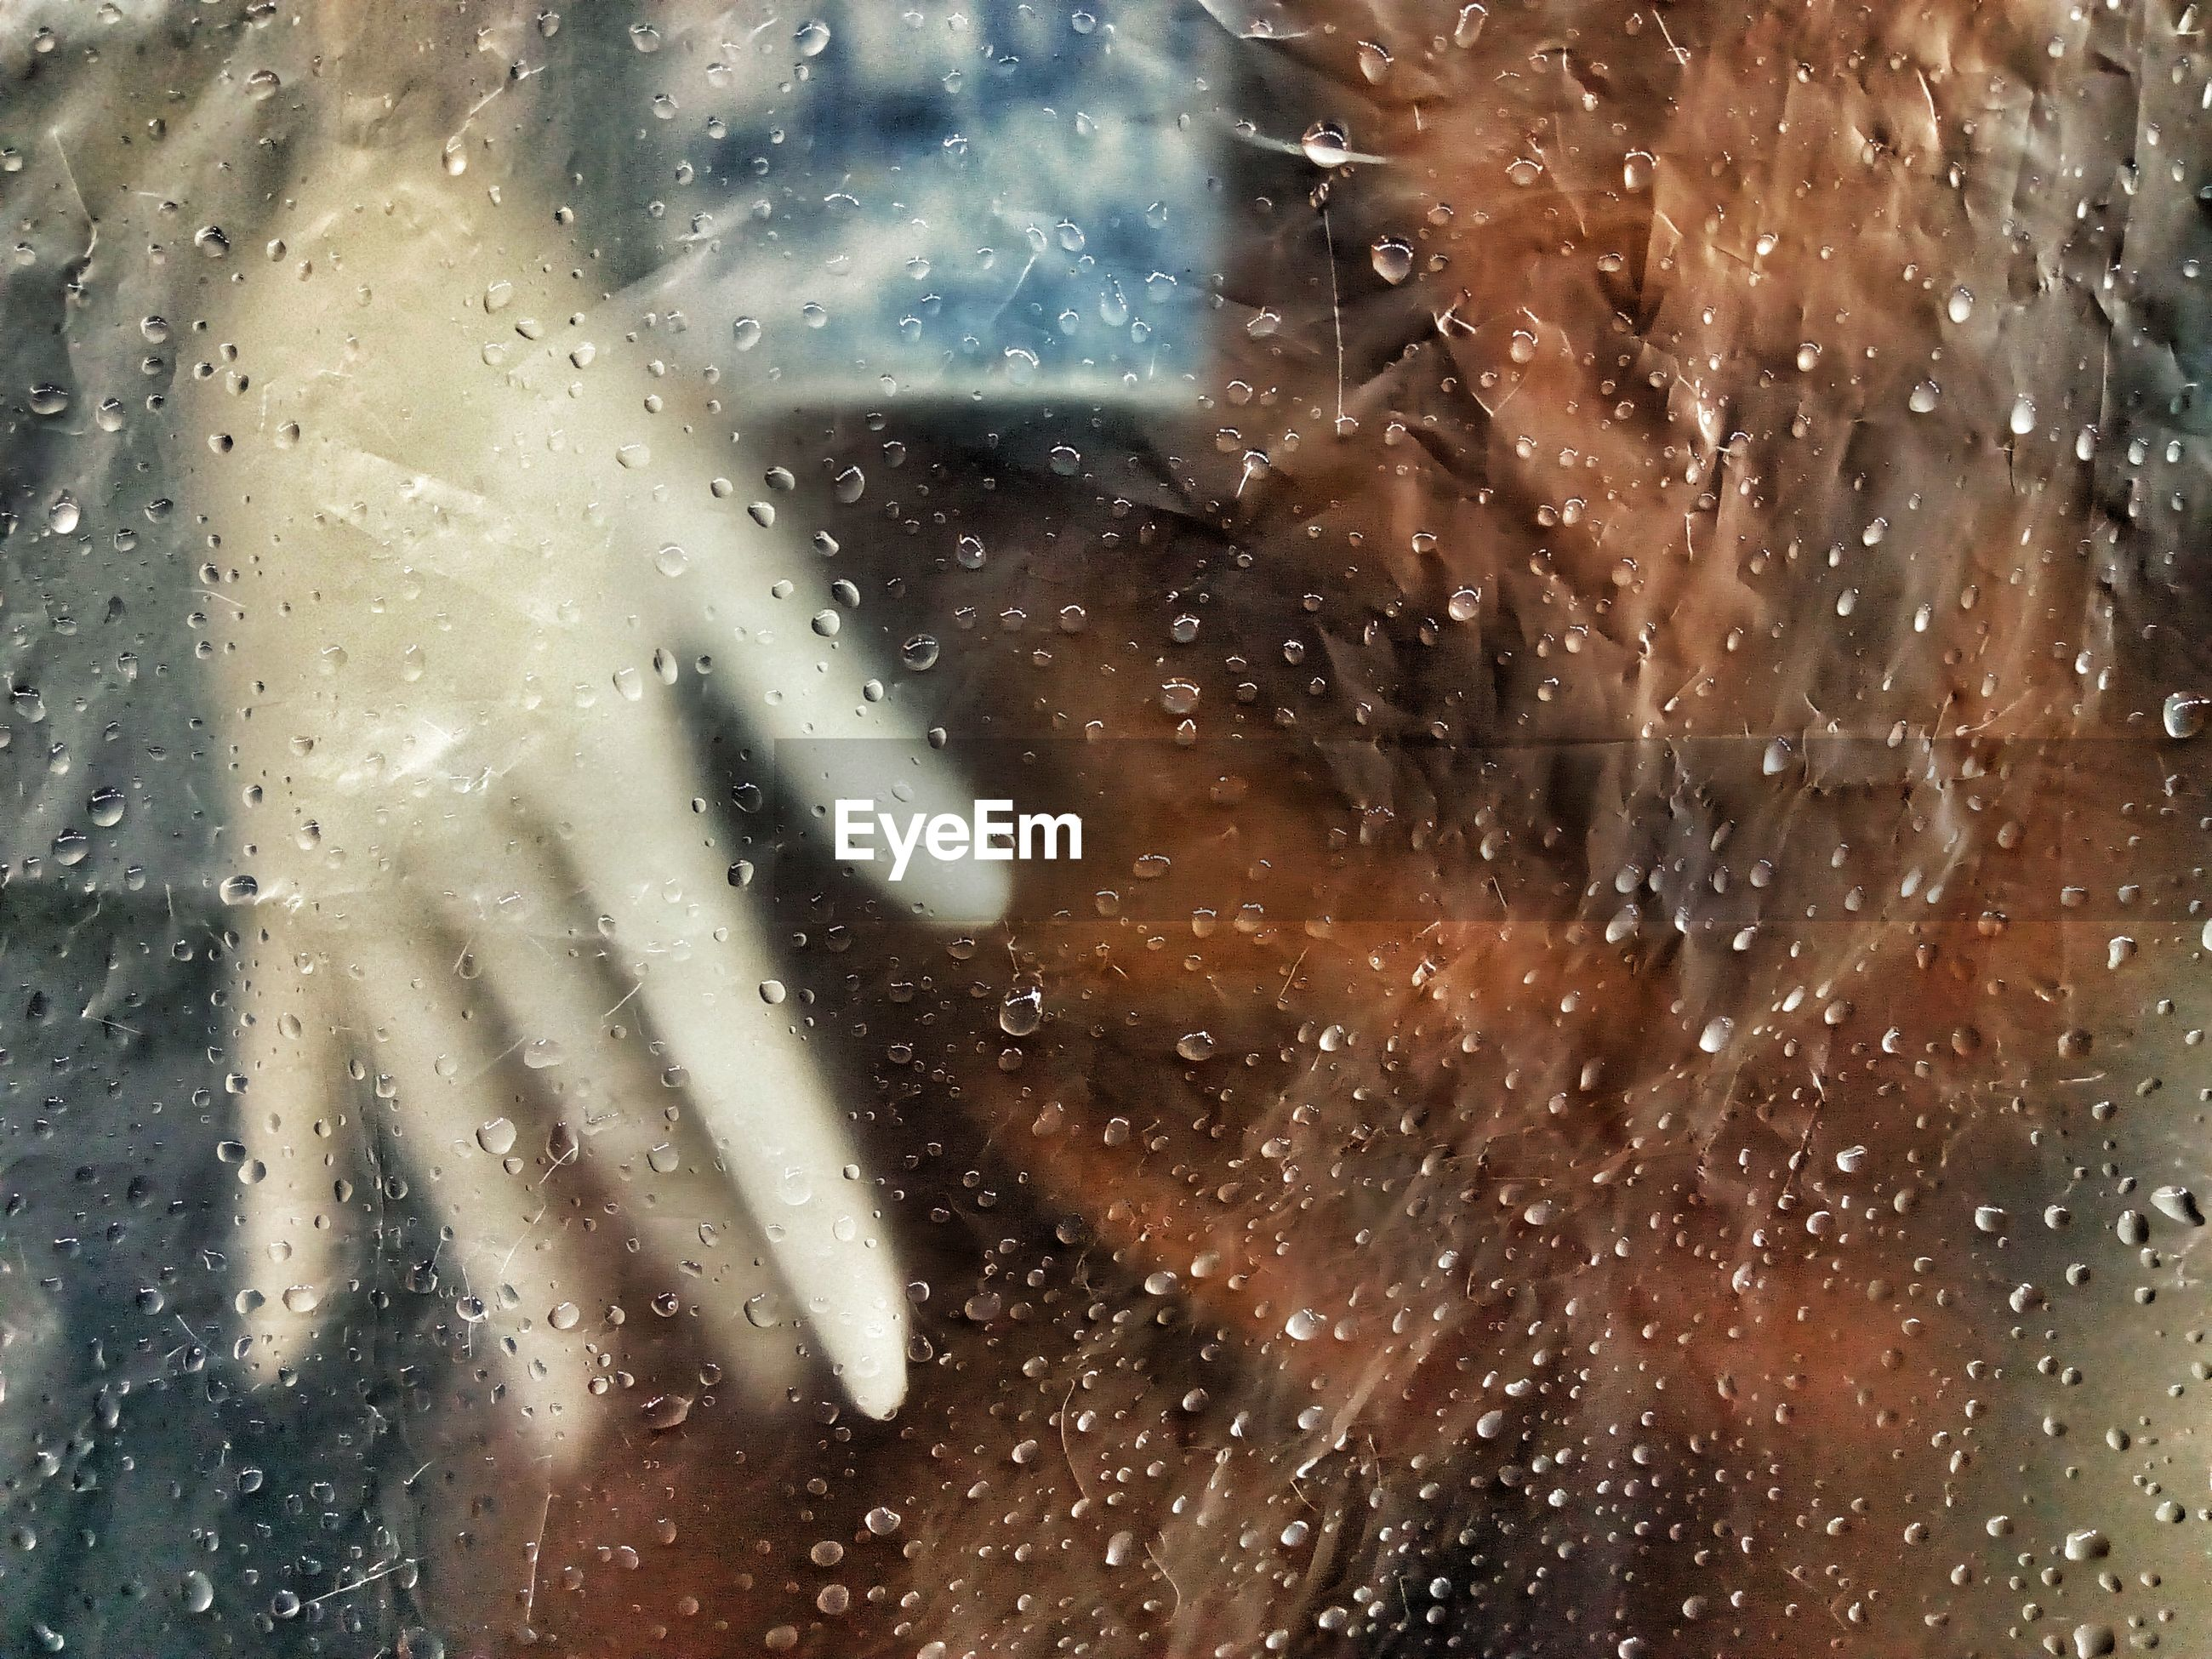 Hand seen through wet plastic